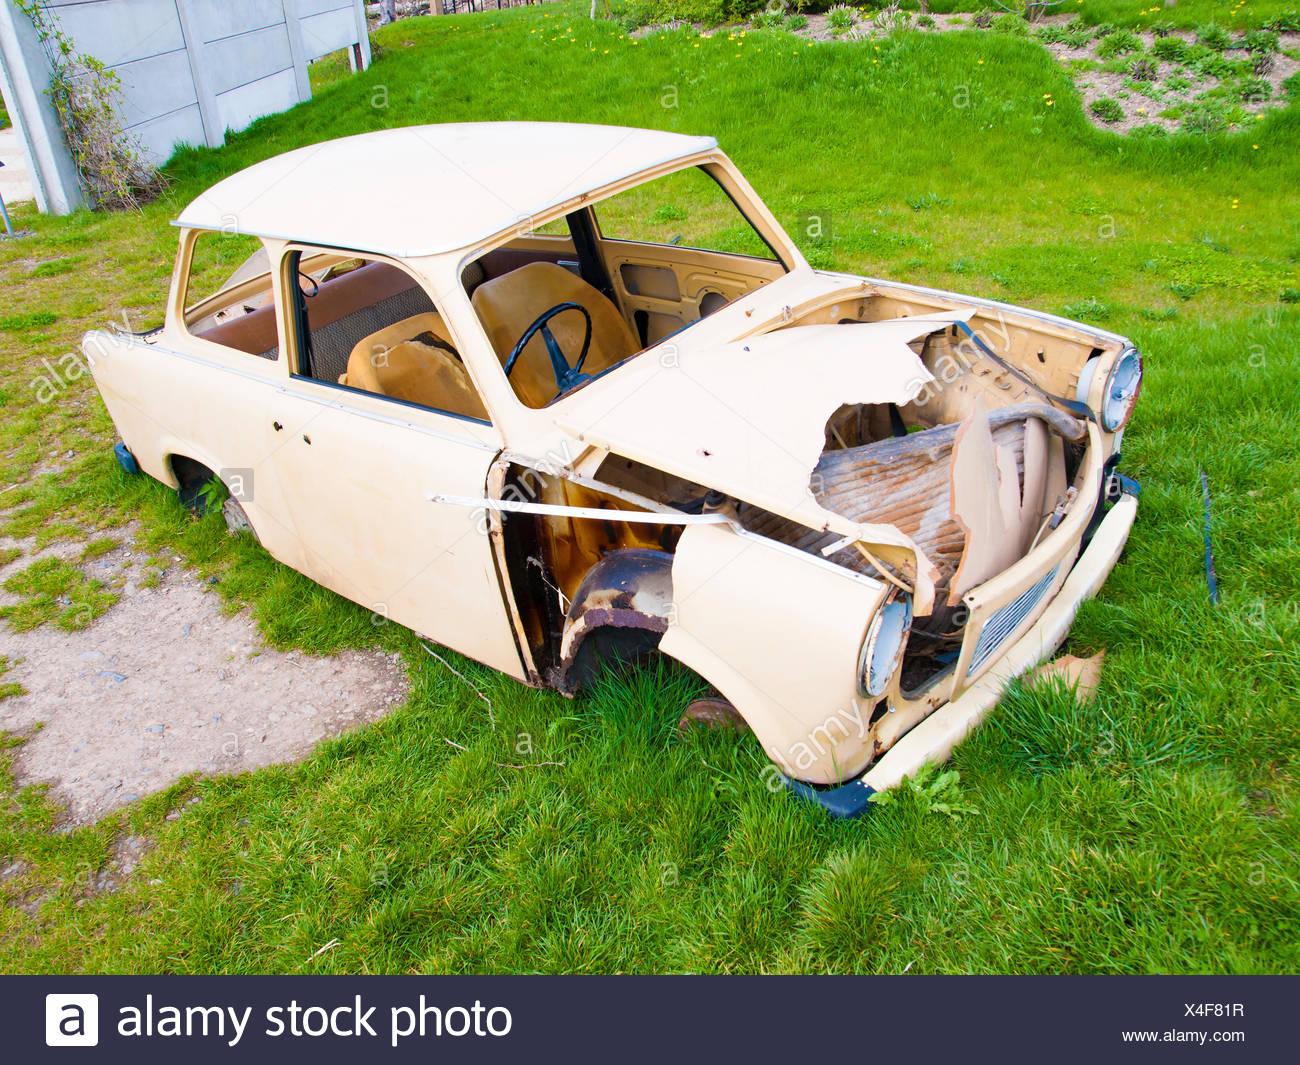 Abandoned old car. - Stock Image